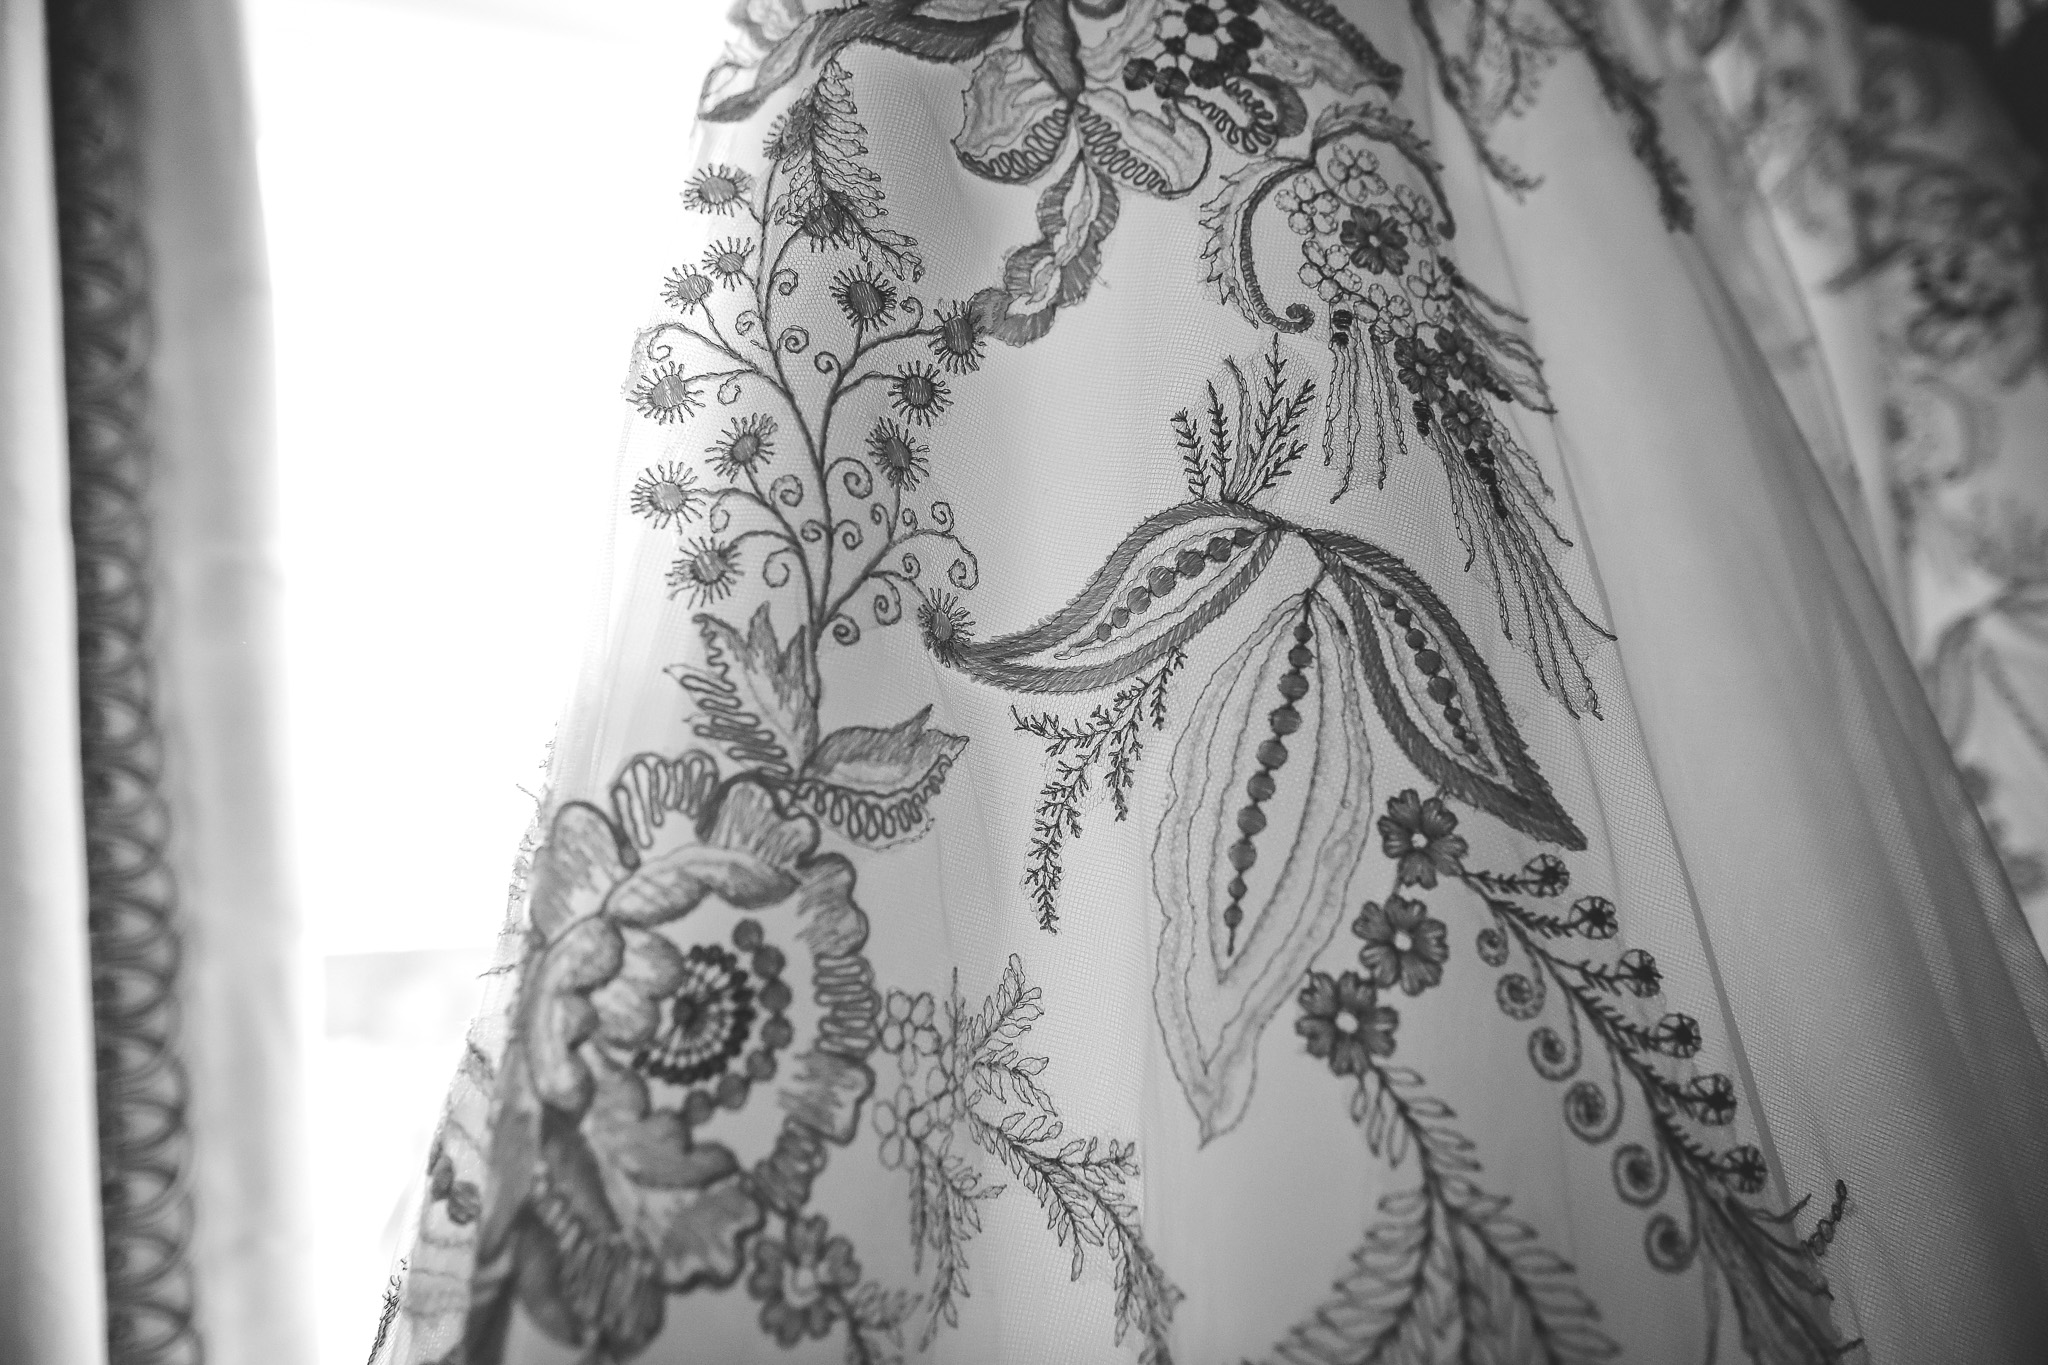 Monochrome image of wedding dress